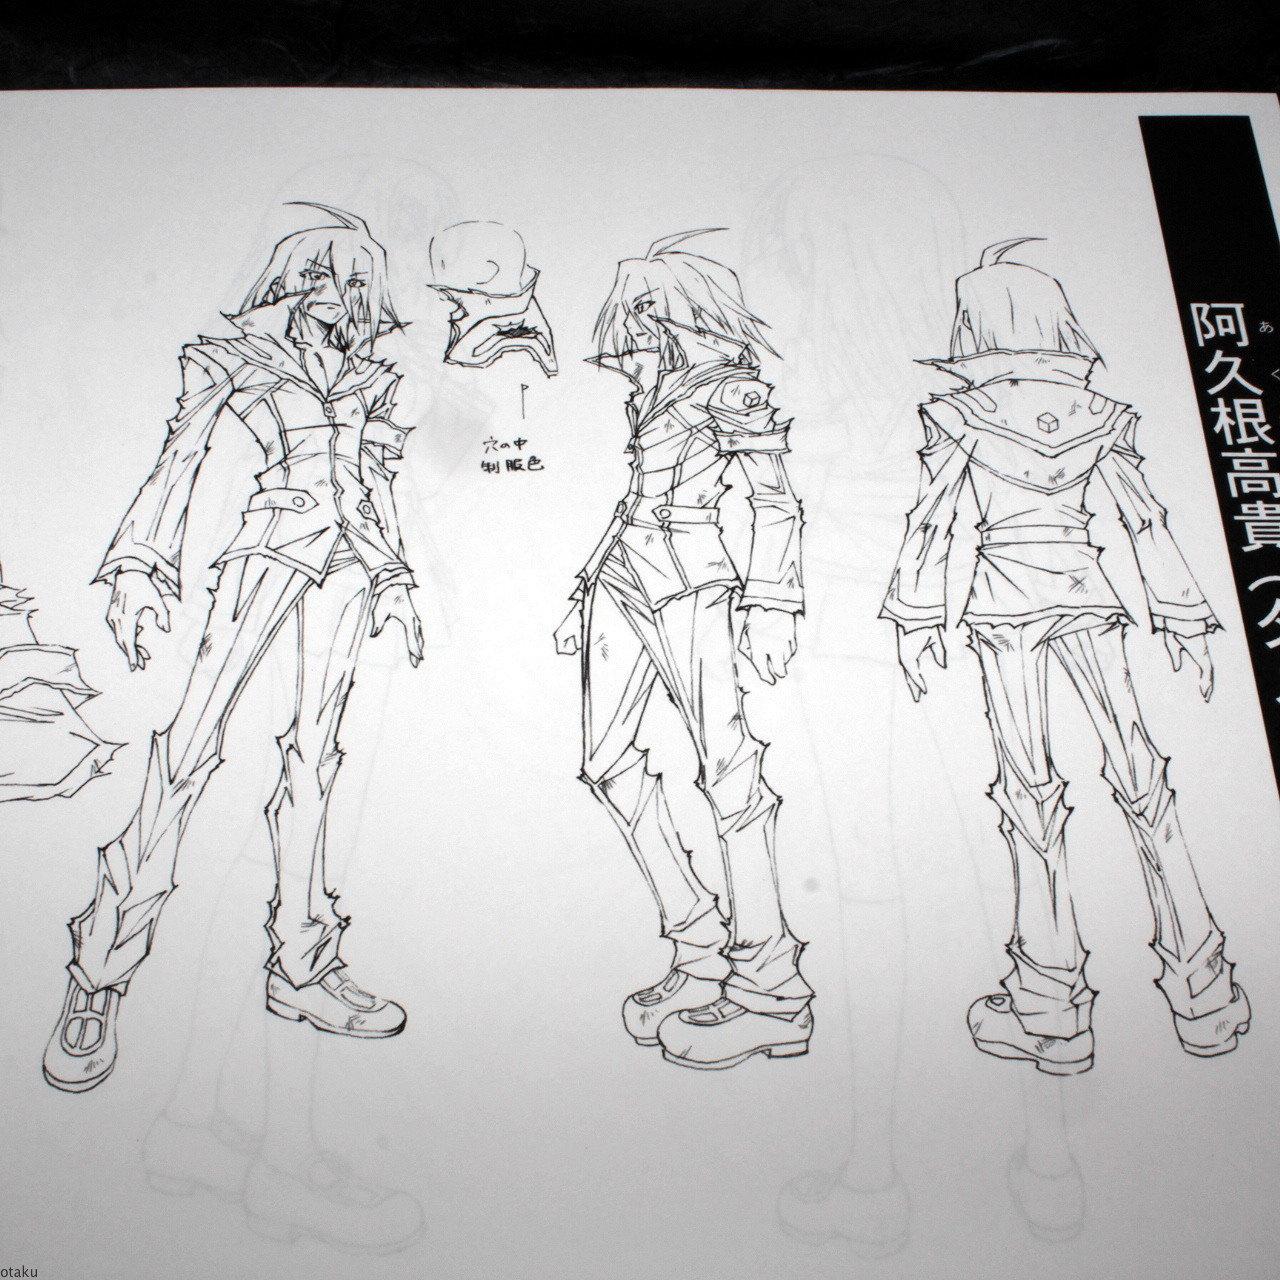 Medaka-Box-Abnormal-Anime-Art-Sketch-Book-otaku-com-wallpaper-wp5209223